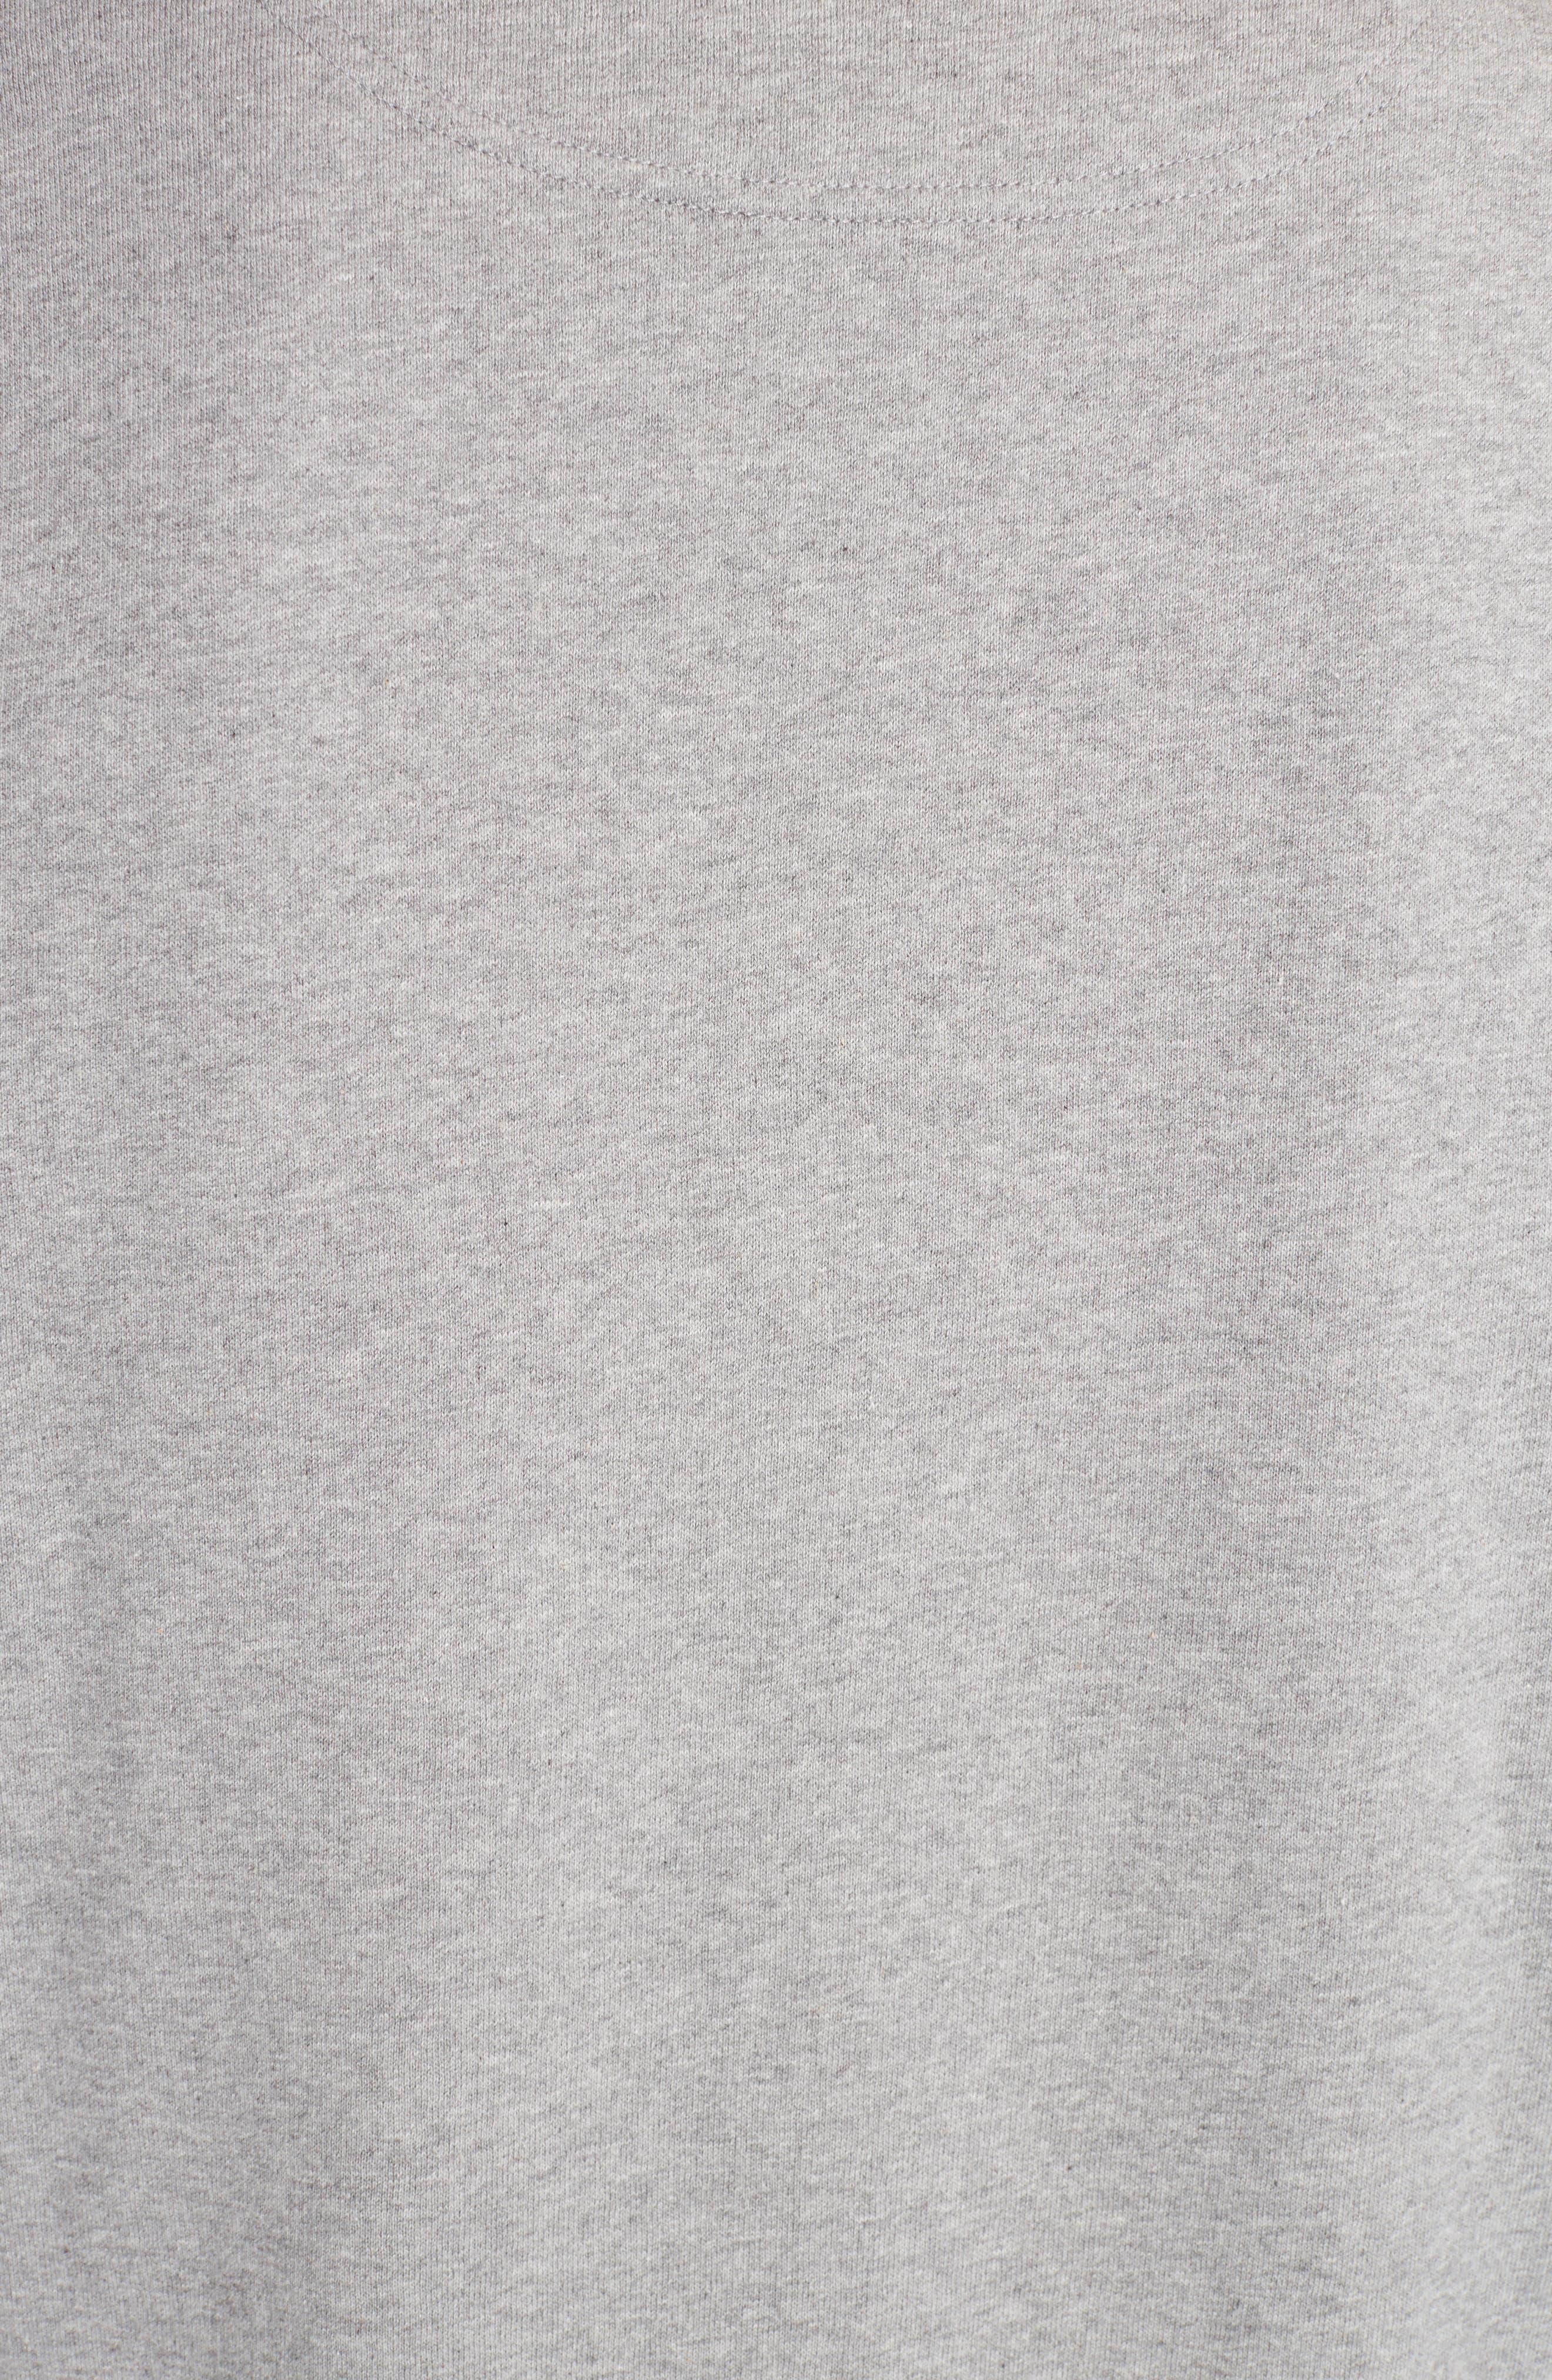 Rainbow Tiger Crewneck Sweatshirt,                             Alternate thumbnail 5, color,                             051